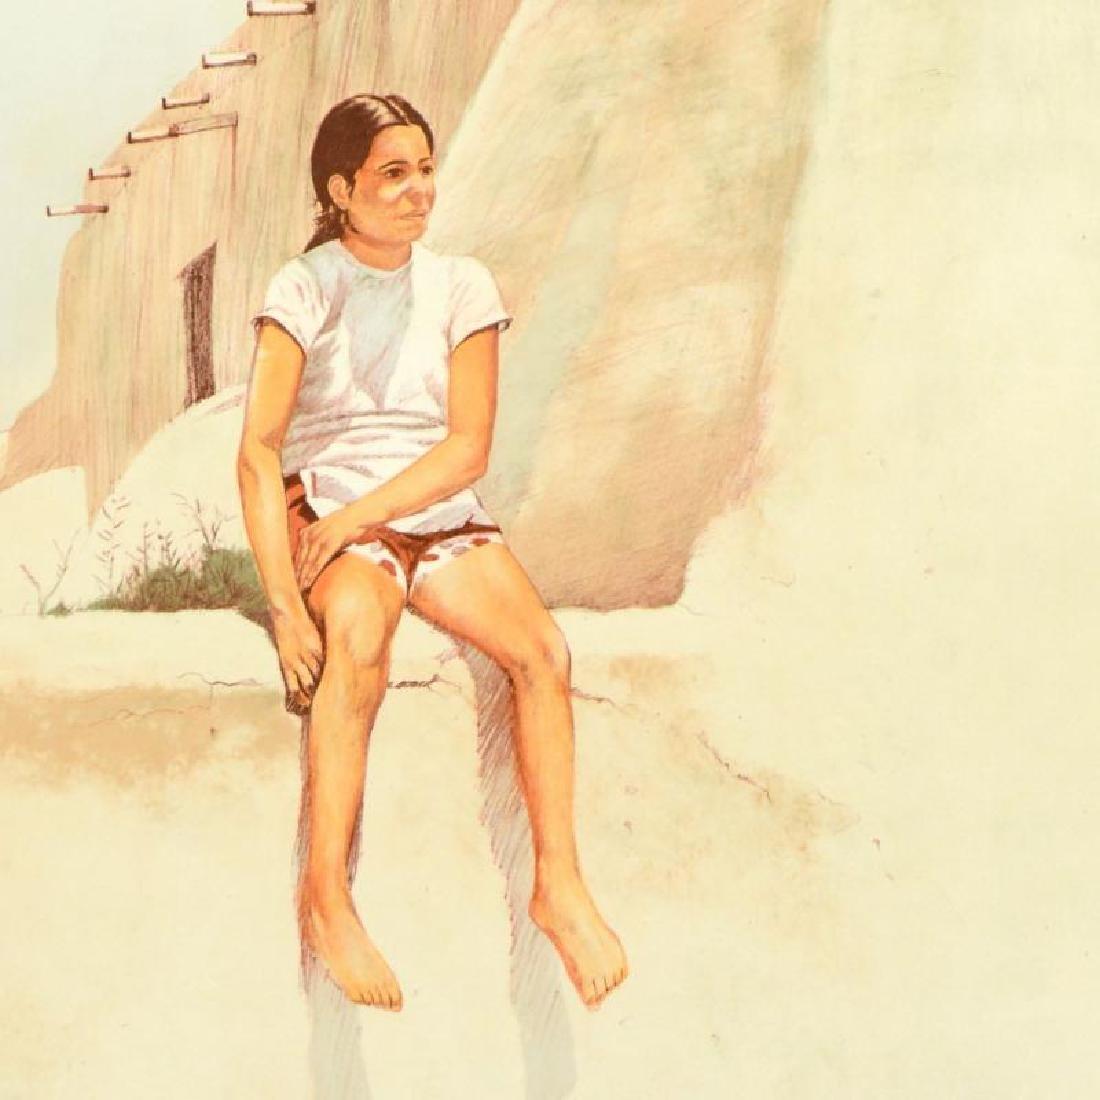 Isleta Indian Girl by Nelson, William - 2